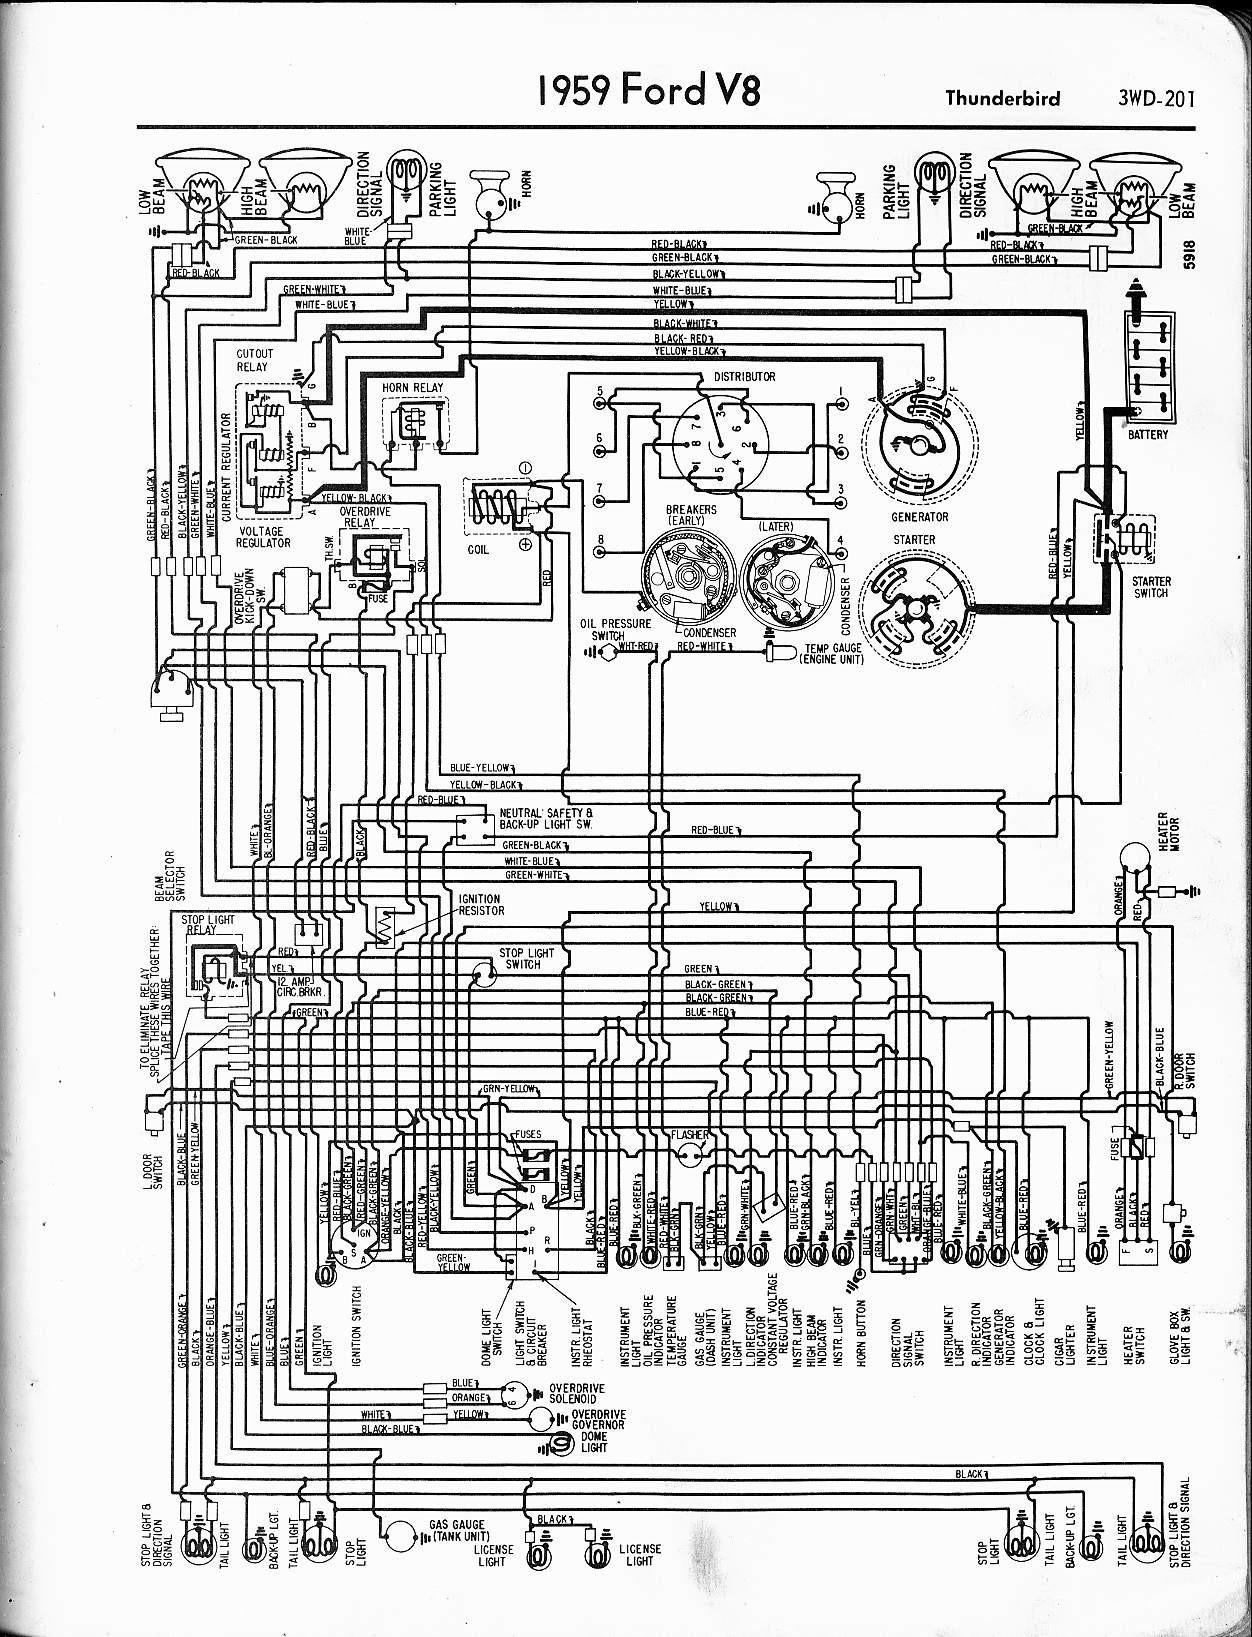 71 impala wiring diagram vv 1758  main wiring diagram 1968 torino gt schematic wiring  main wiring diagram 1968 torino gt